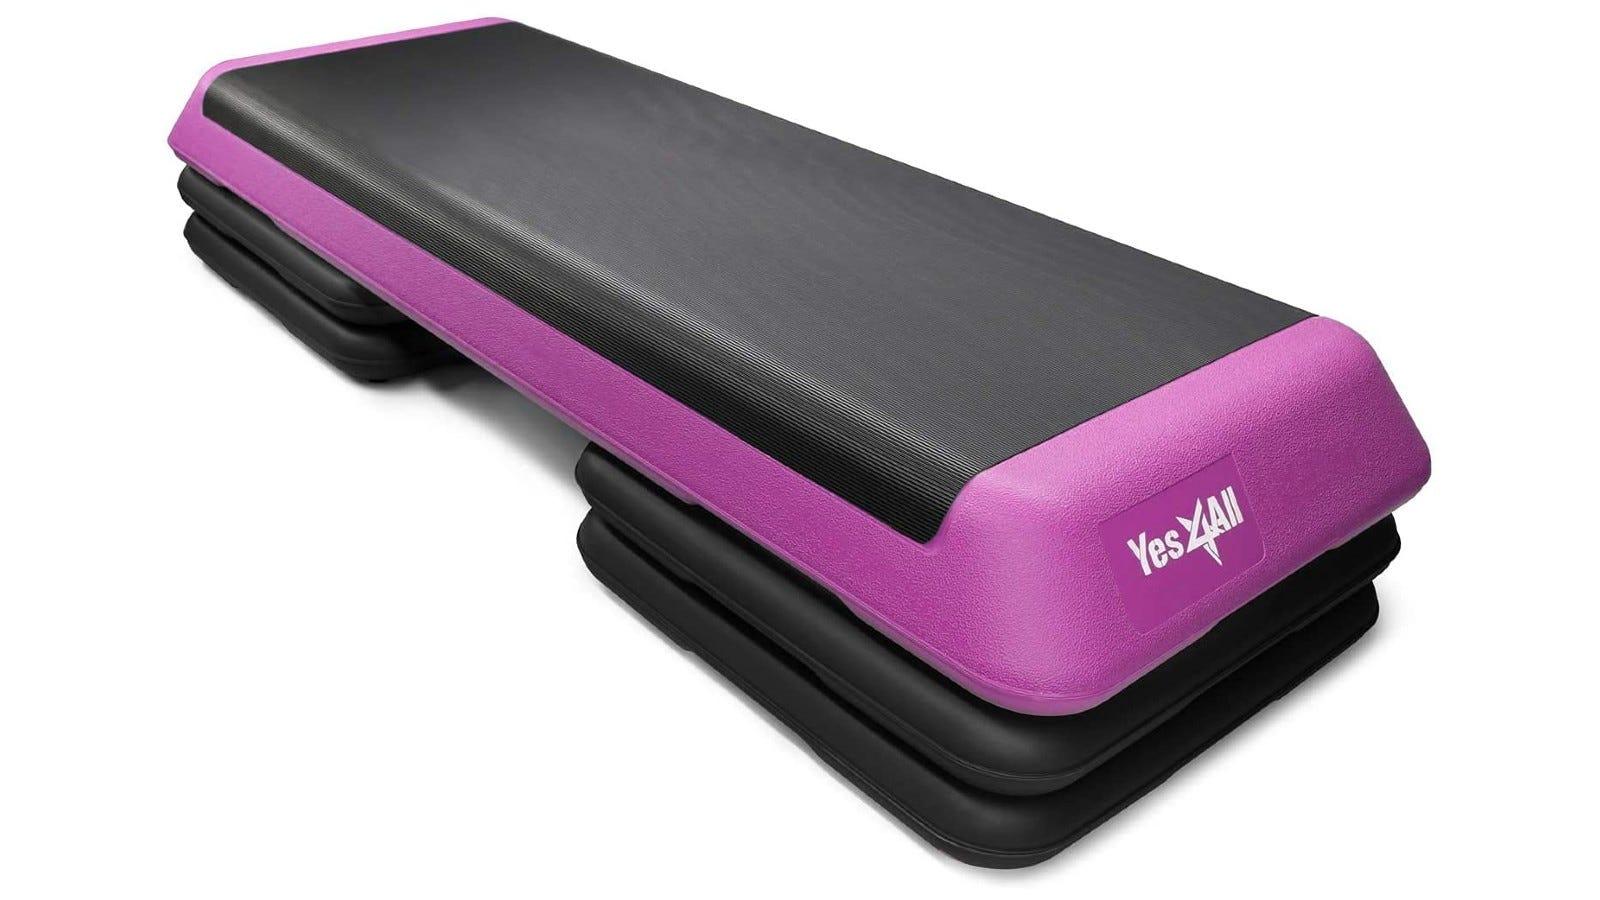 A black step platform with purple detailing.